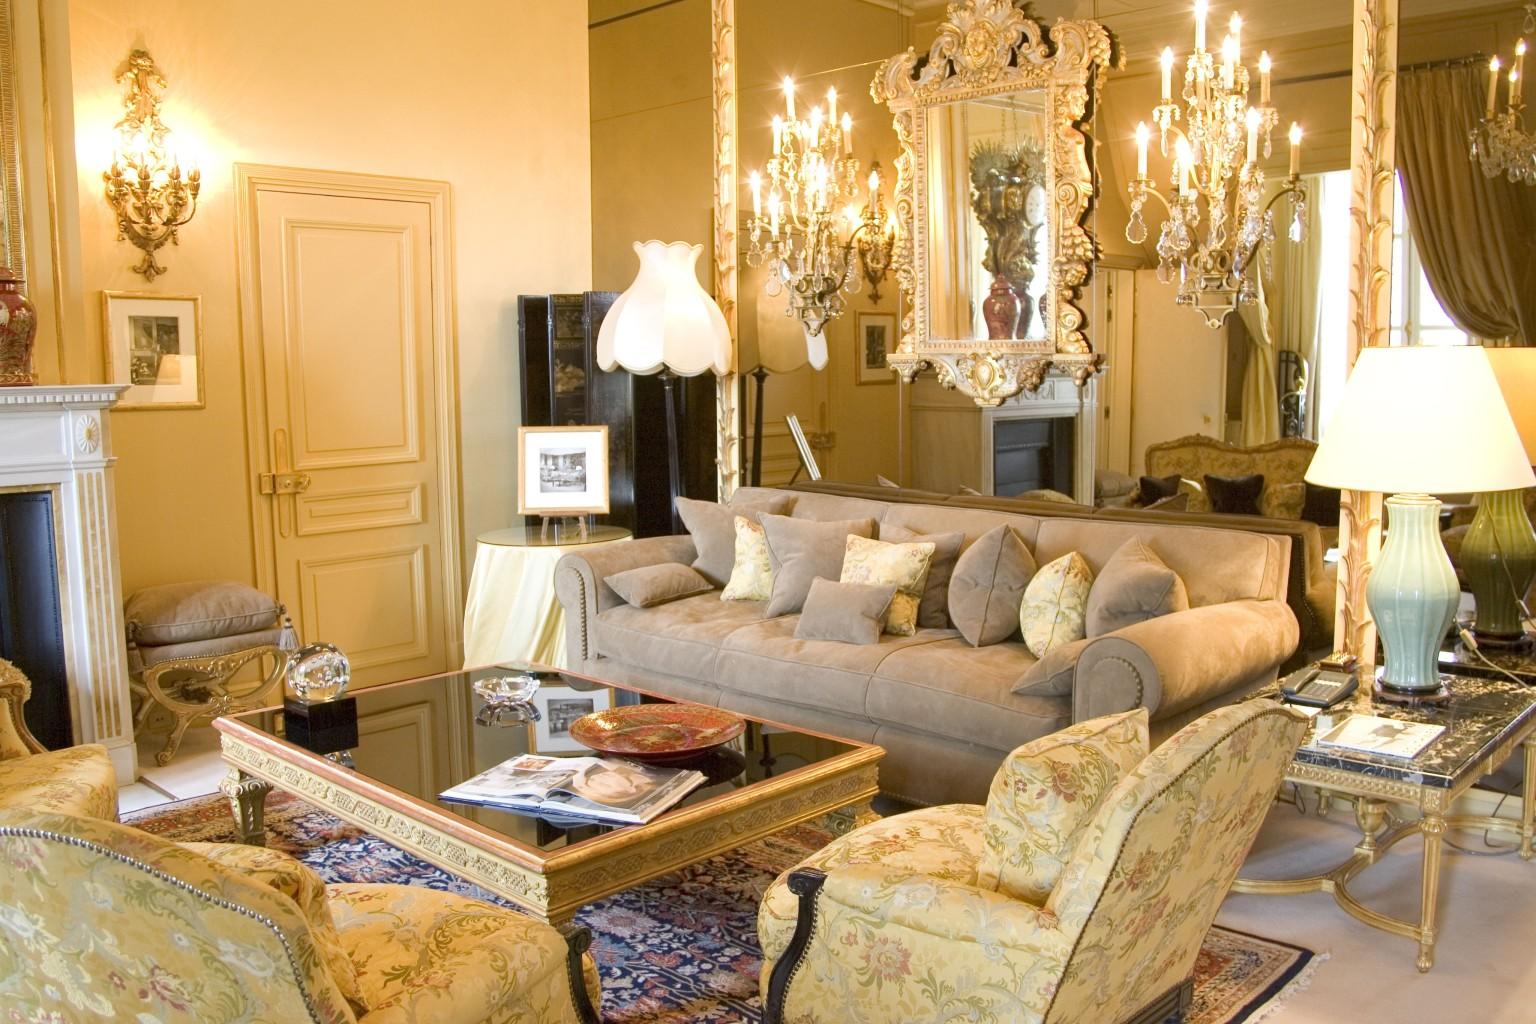 A Rare Look Inside Coco Chanel's Fabulous Parisian ...